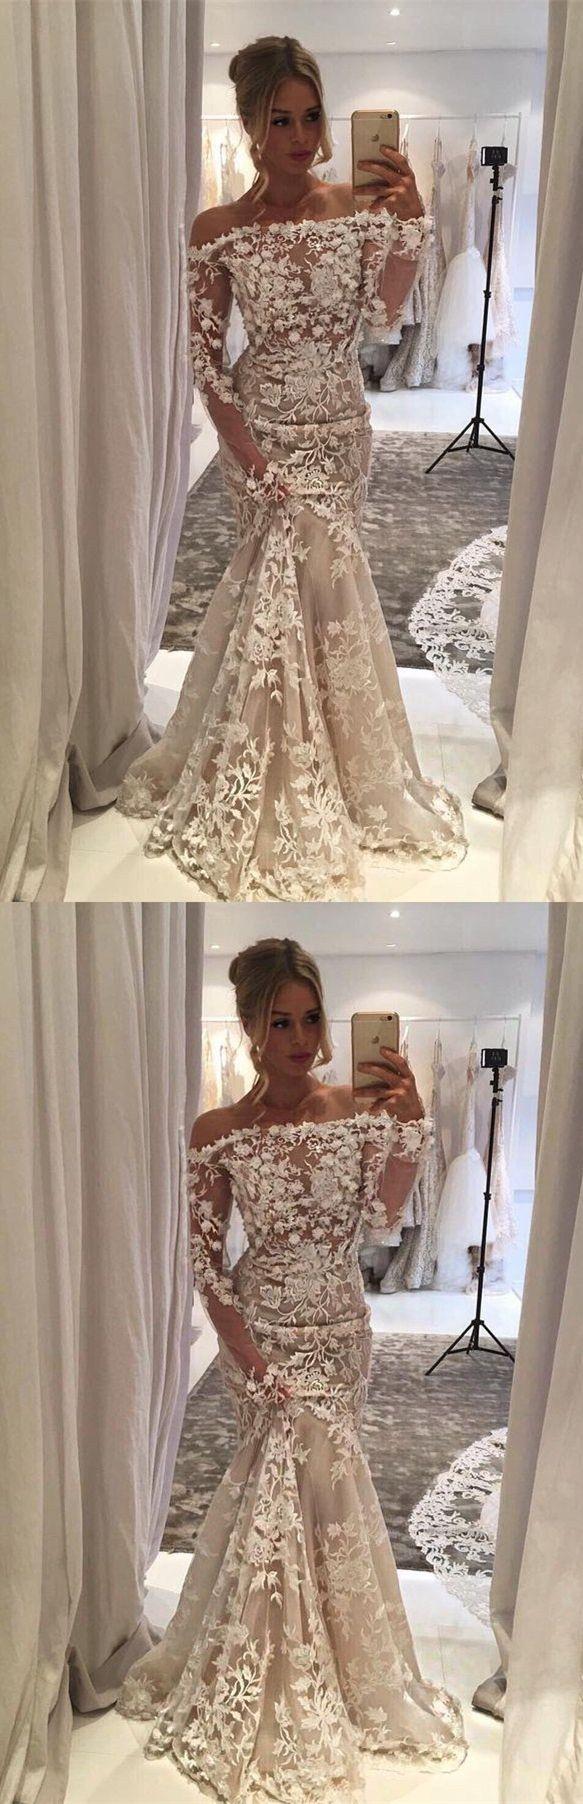 mermaid off shoulder wedding dresses with long sleeves appliques, #weddingdress